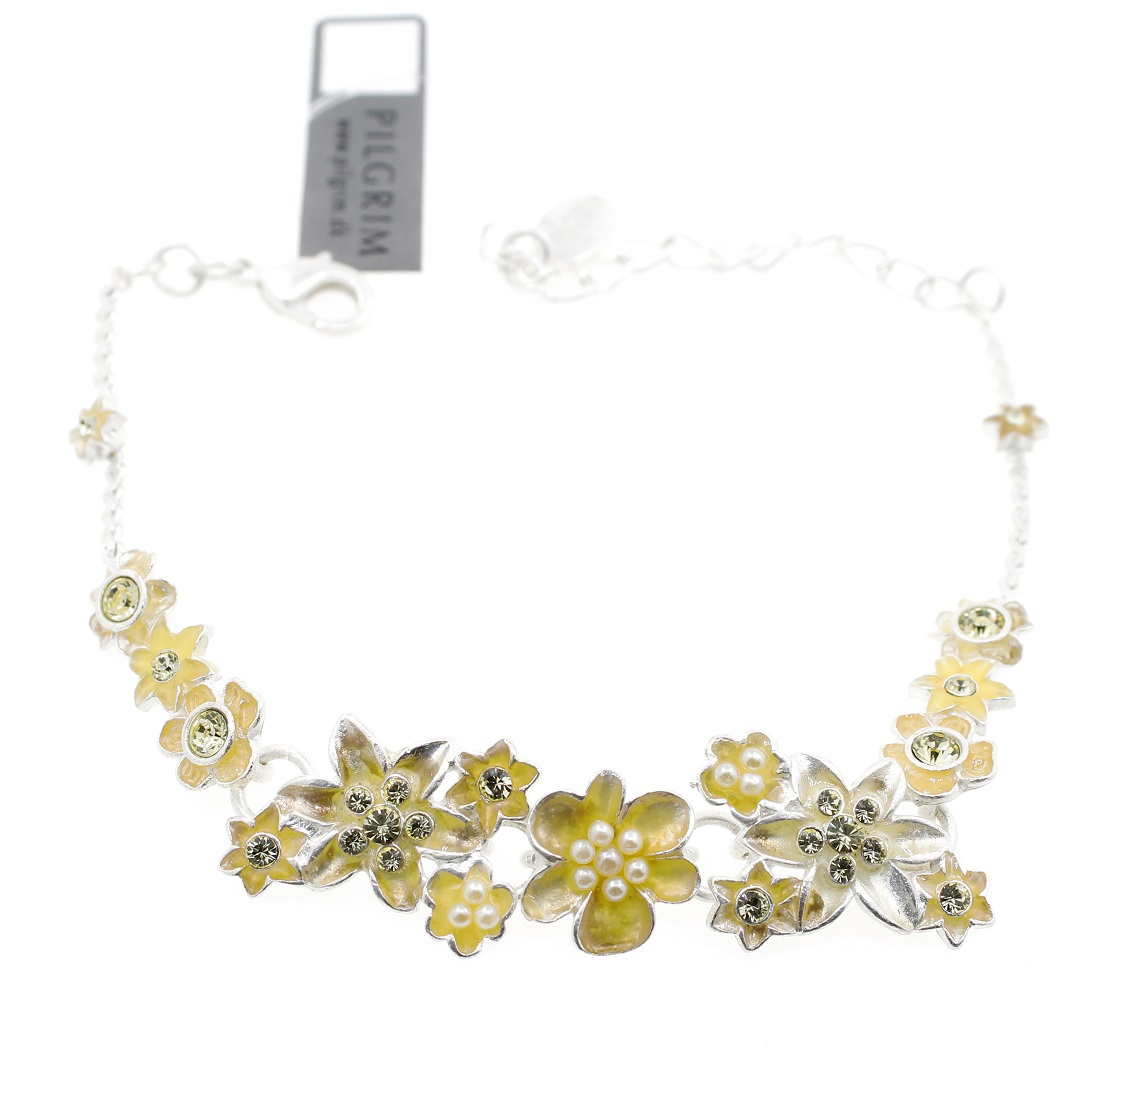 PILGRIM - Enchanted Flower - Clusters of Flowers Bracelet - Silver Plate/Yellow BNWT